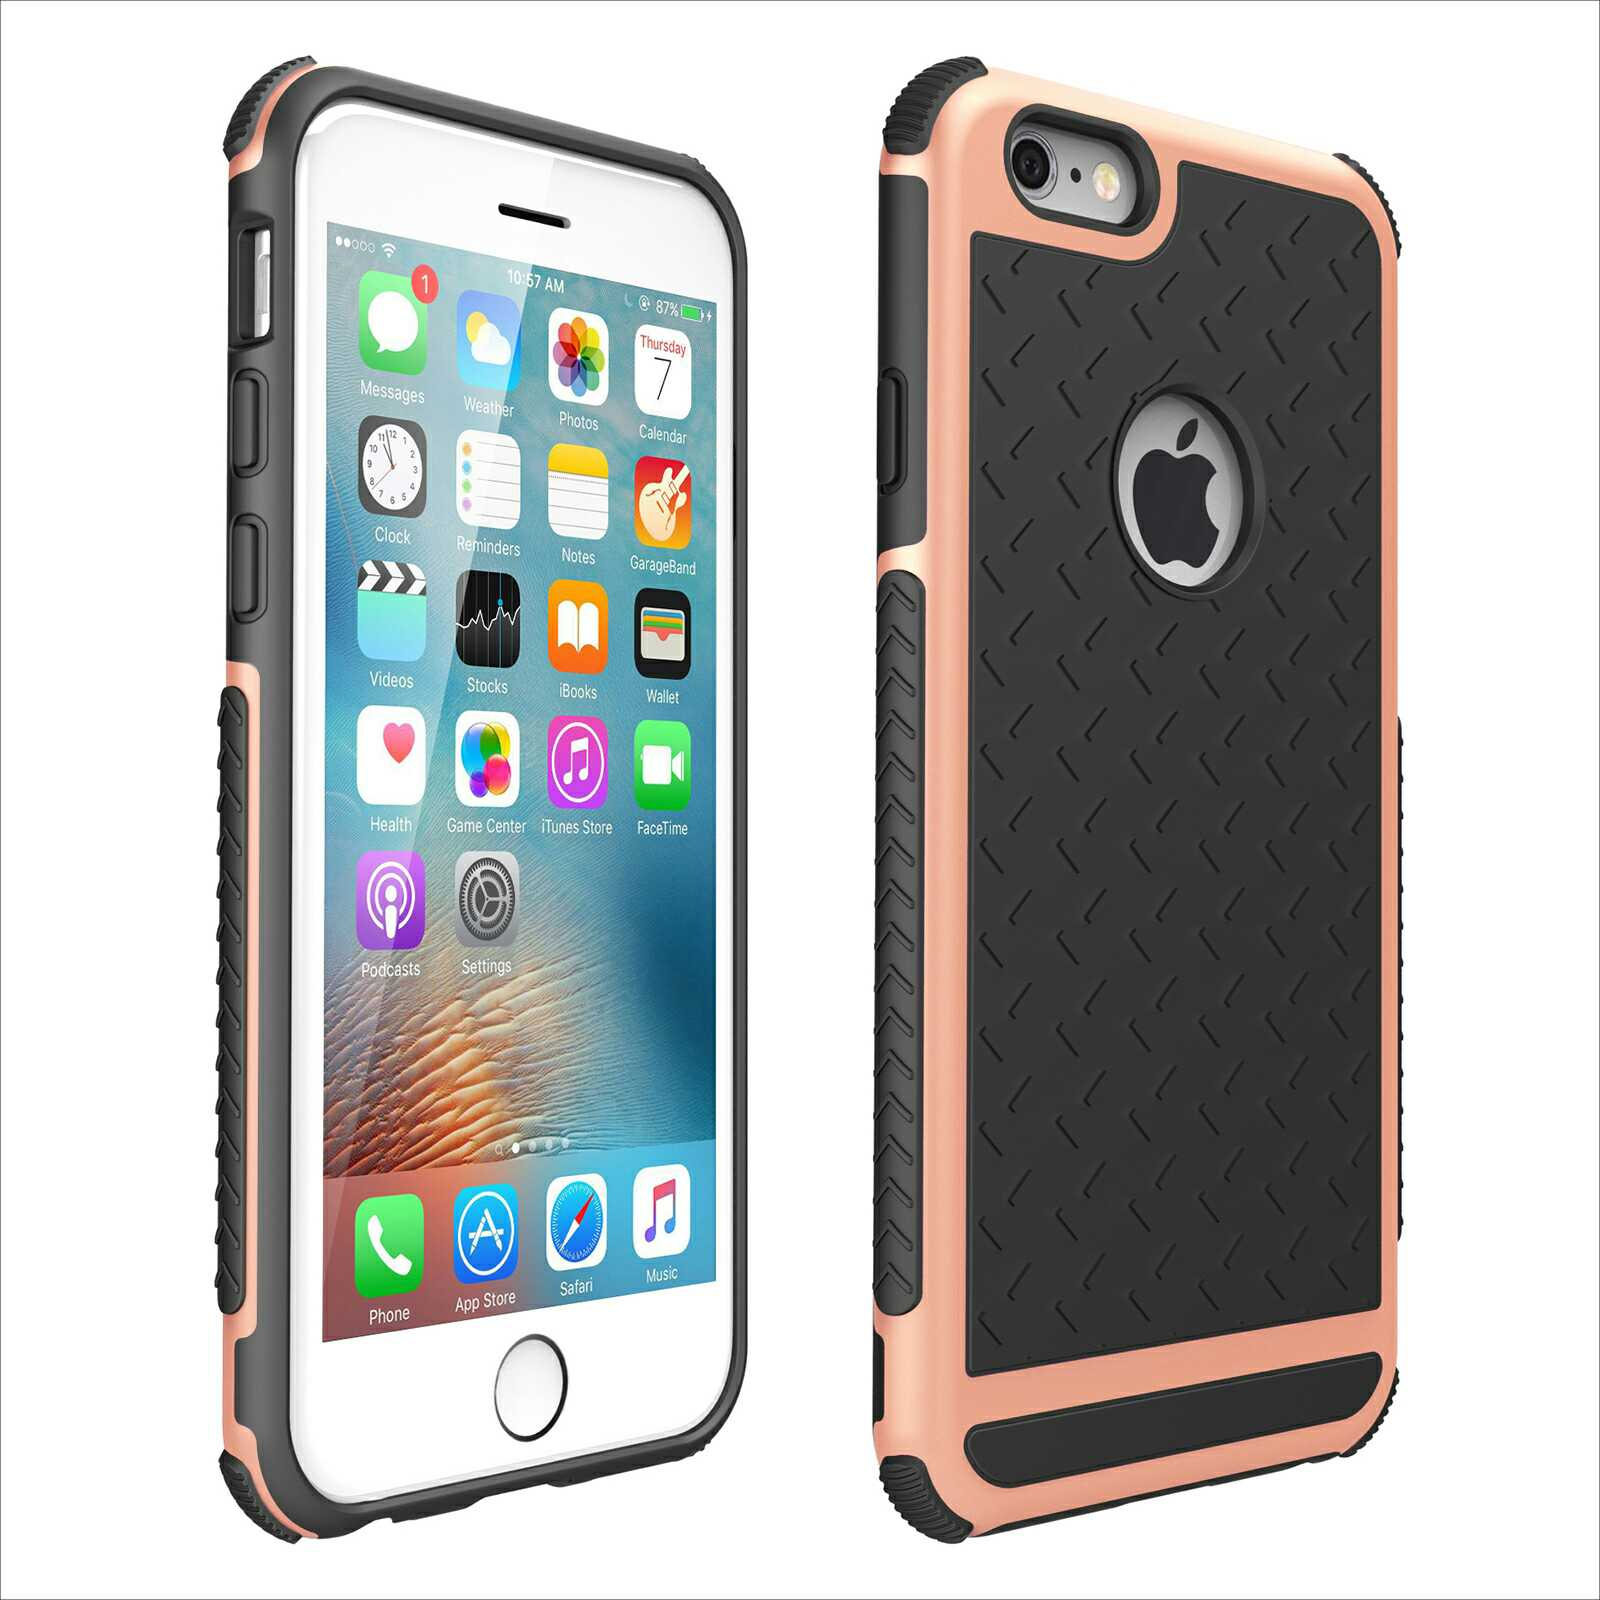 Apple - Iphone 5C : Apple - Iphone 5C-Pink Gold-8241